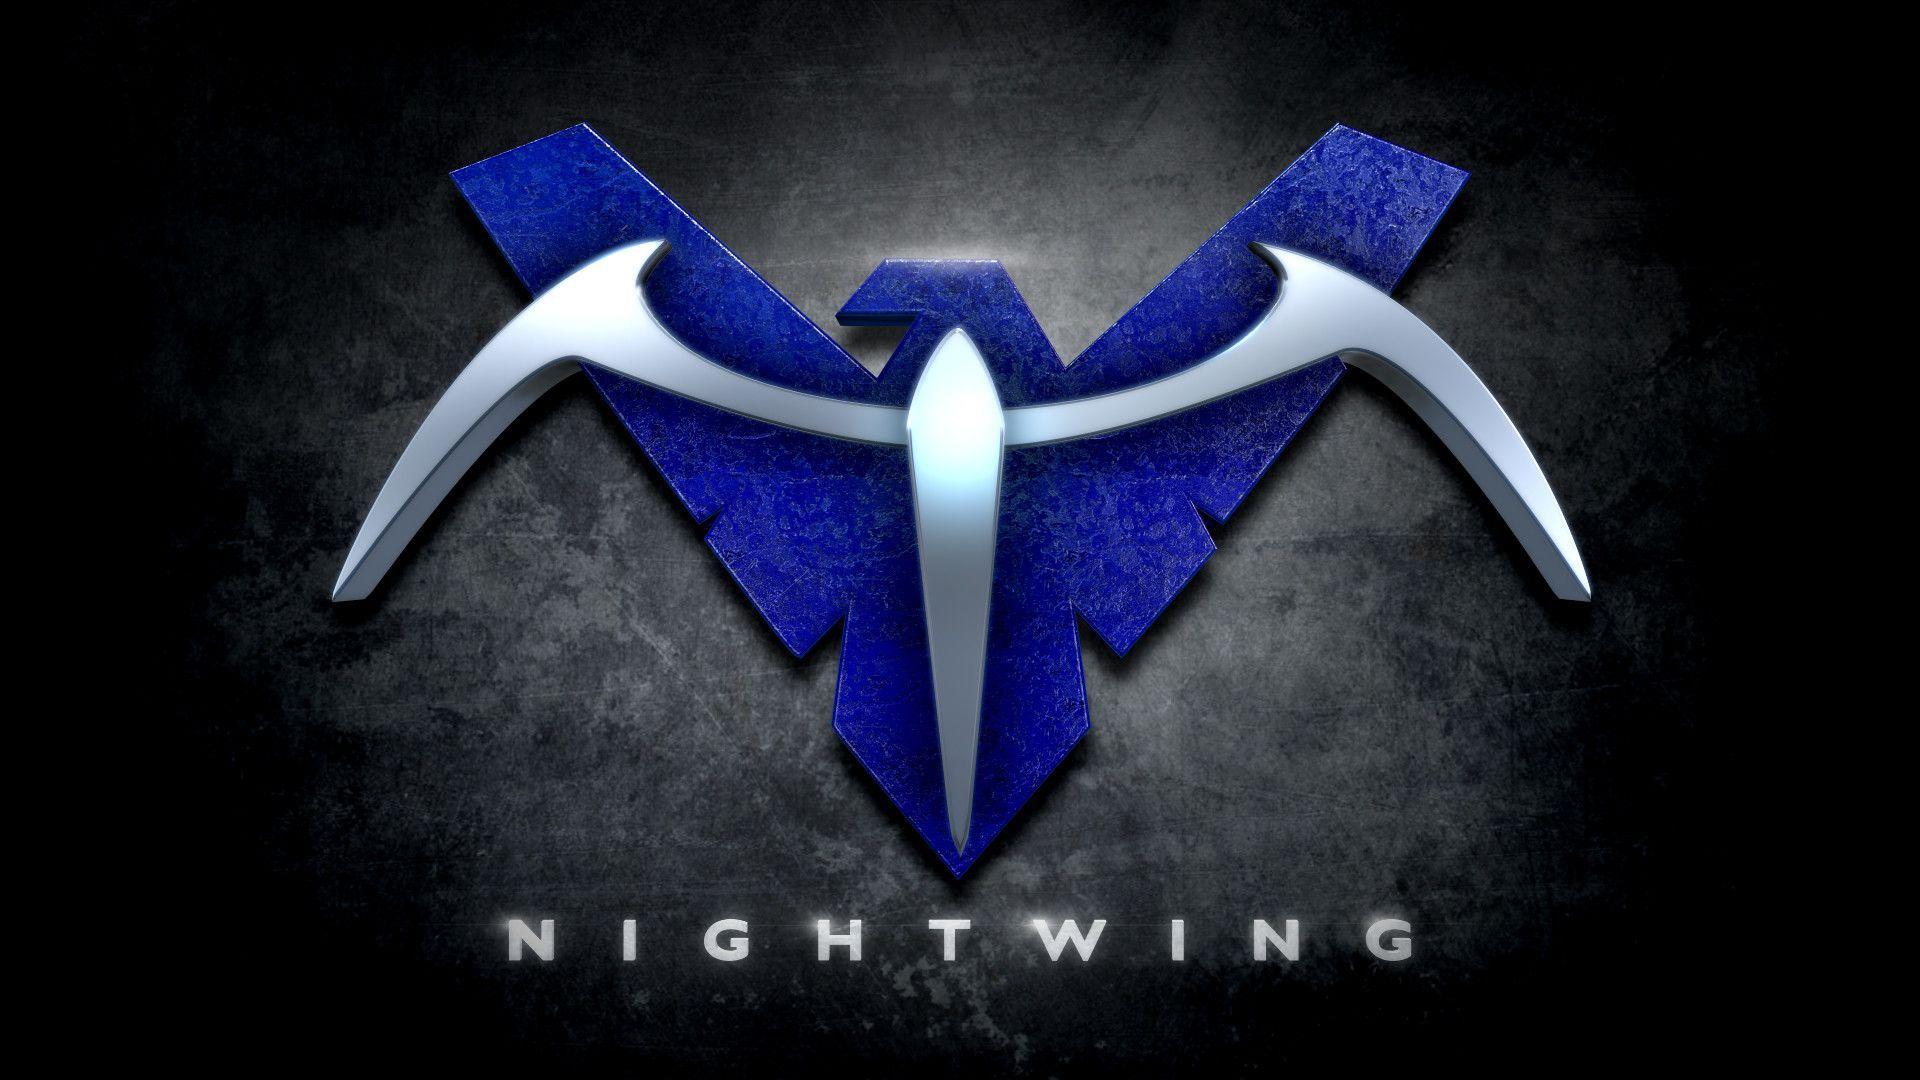 73 Nightwing Logo Wallpapers on WallpaperPlay 4K, 2020